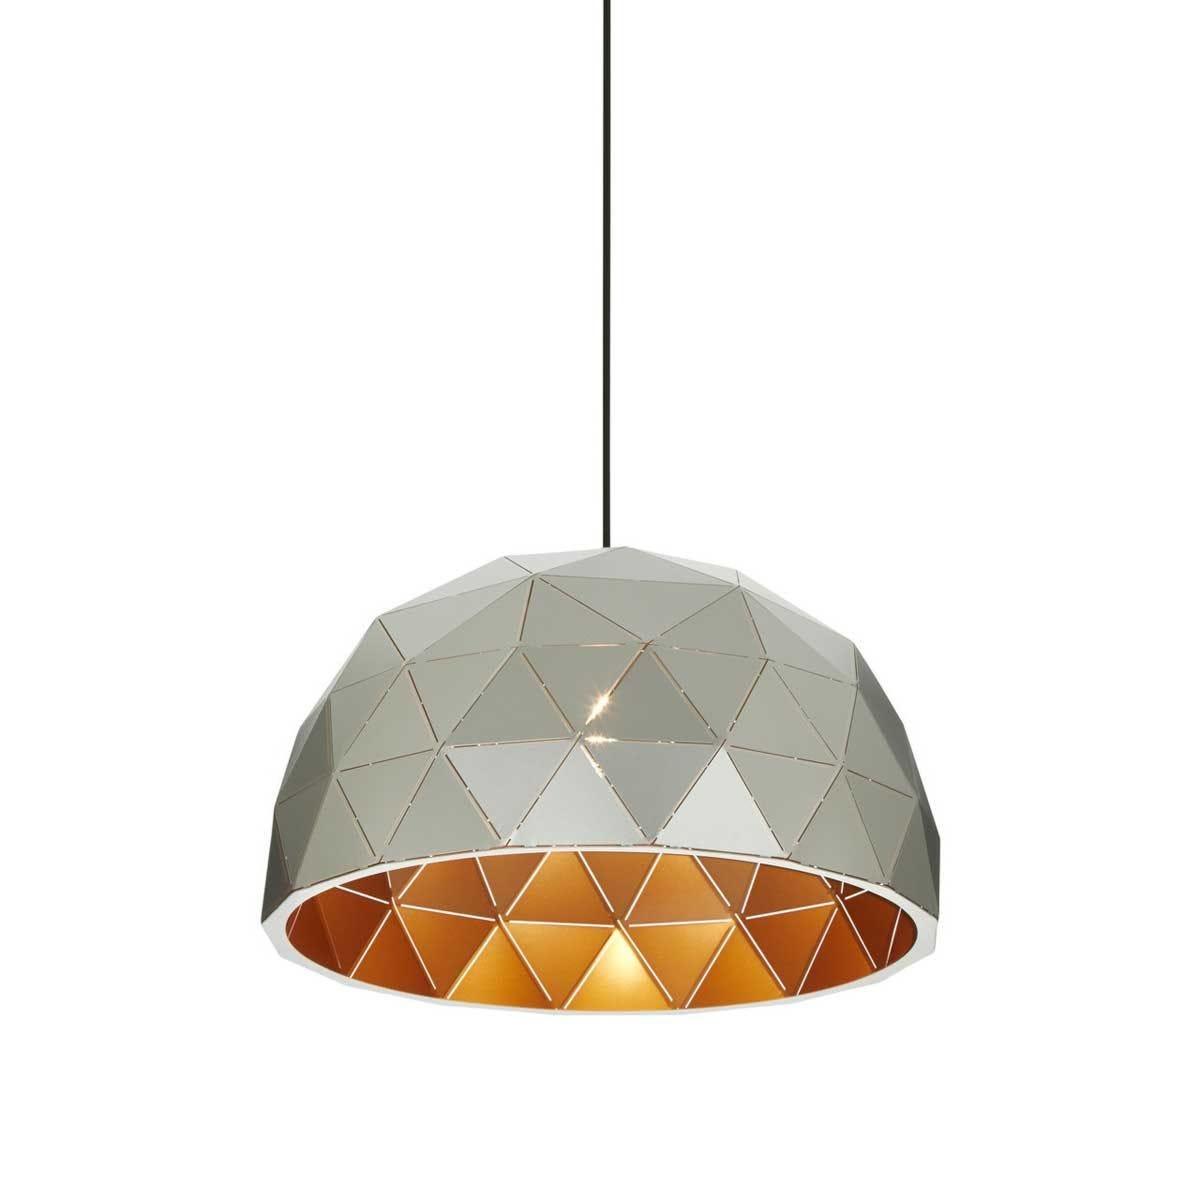 Premier Housewares Mateo Medium Dome Pendant Light - Silver